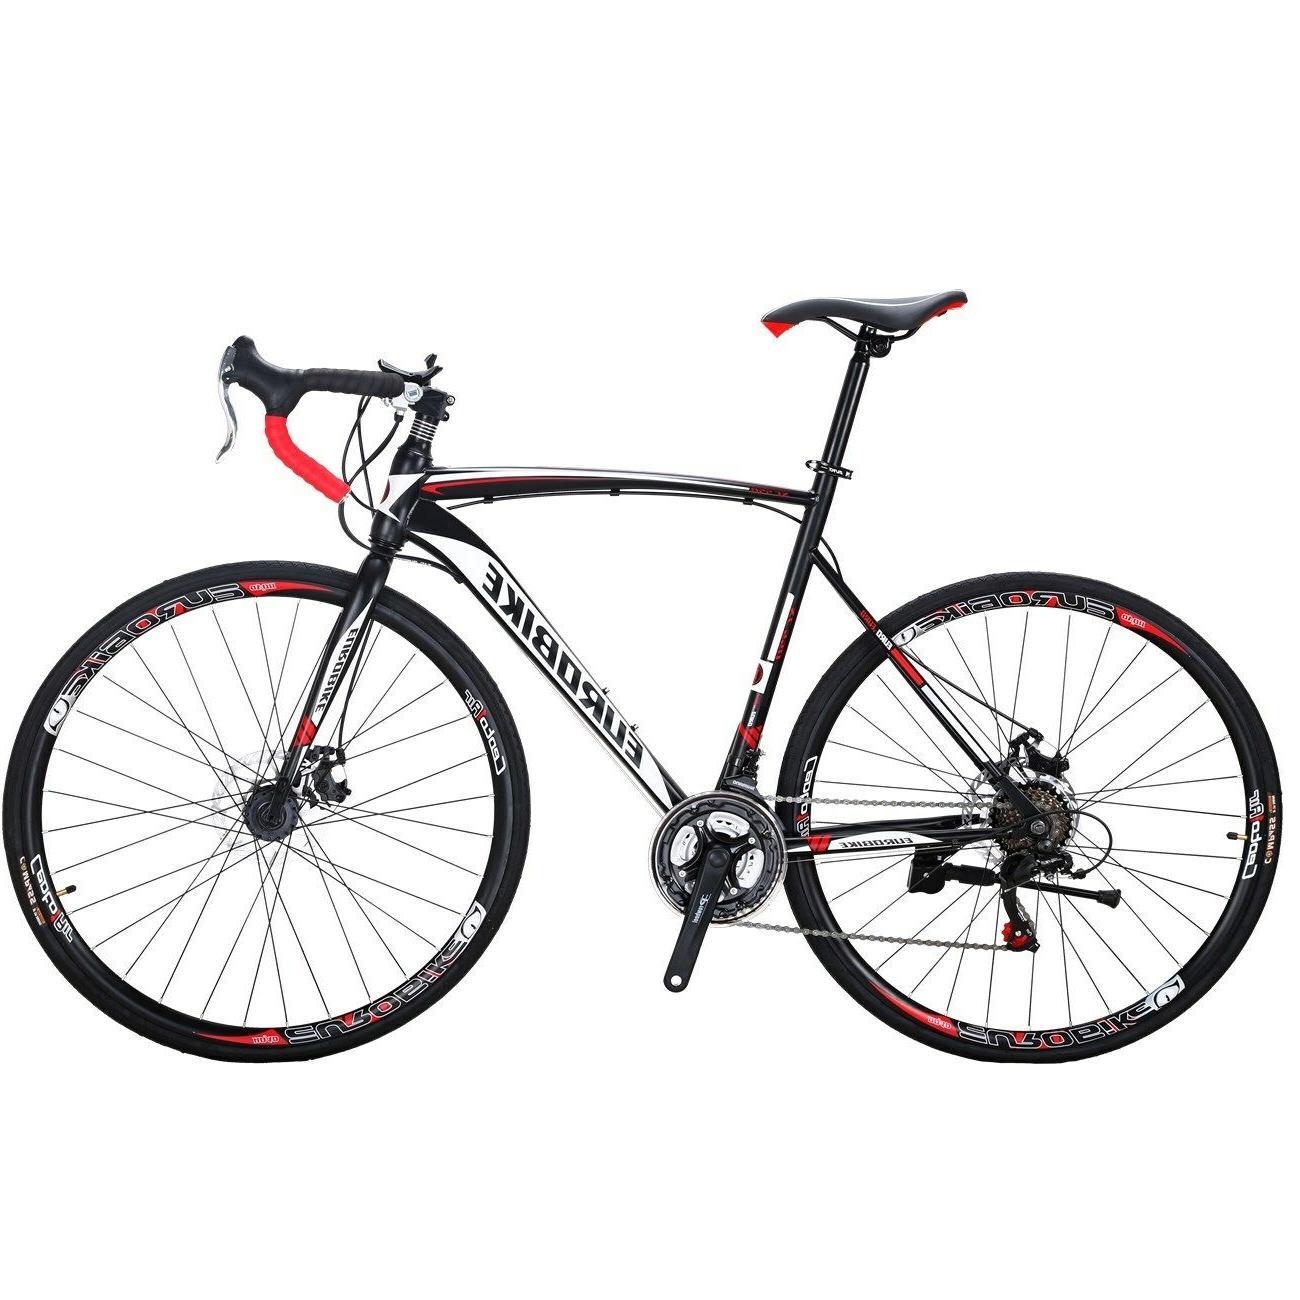 2018 Road Bike 21 Speed Bicyle Men's Cycling 54cm